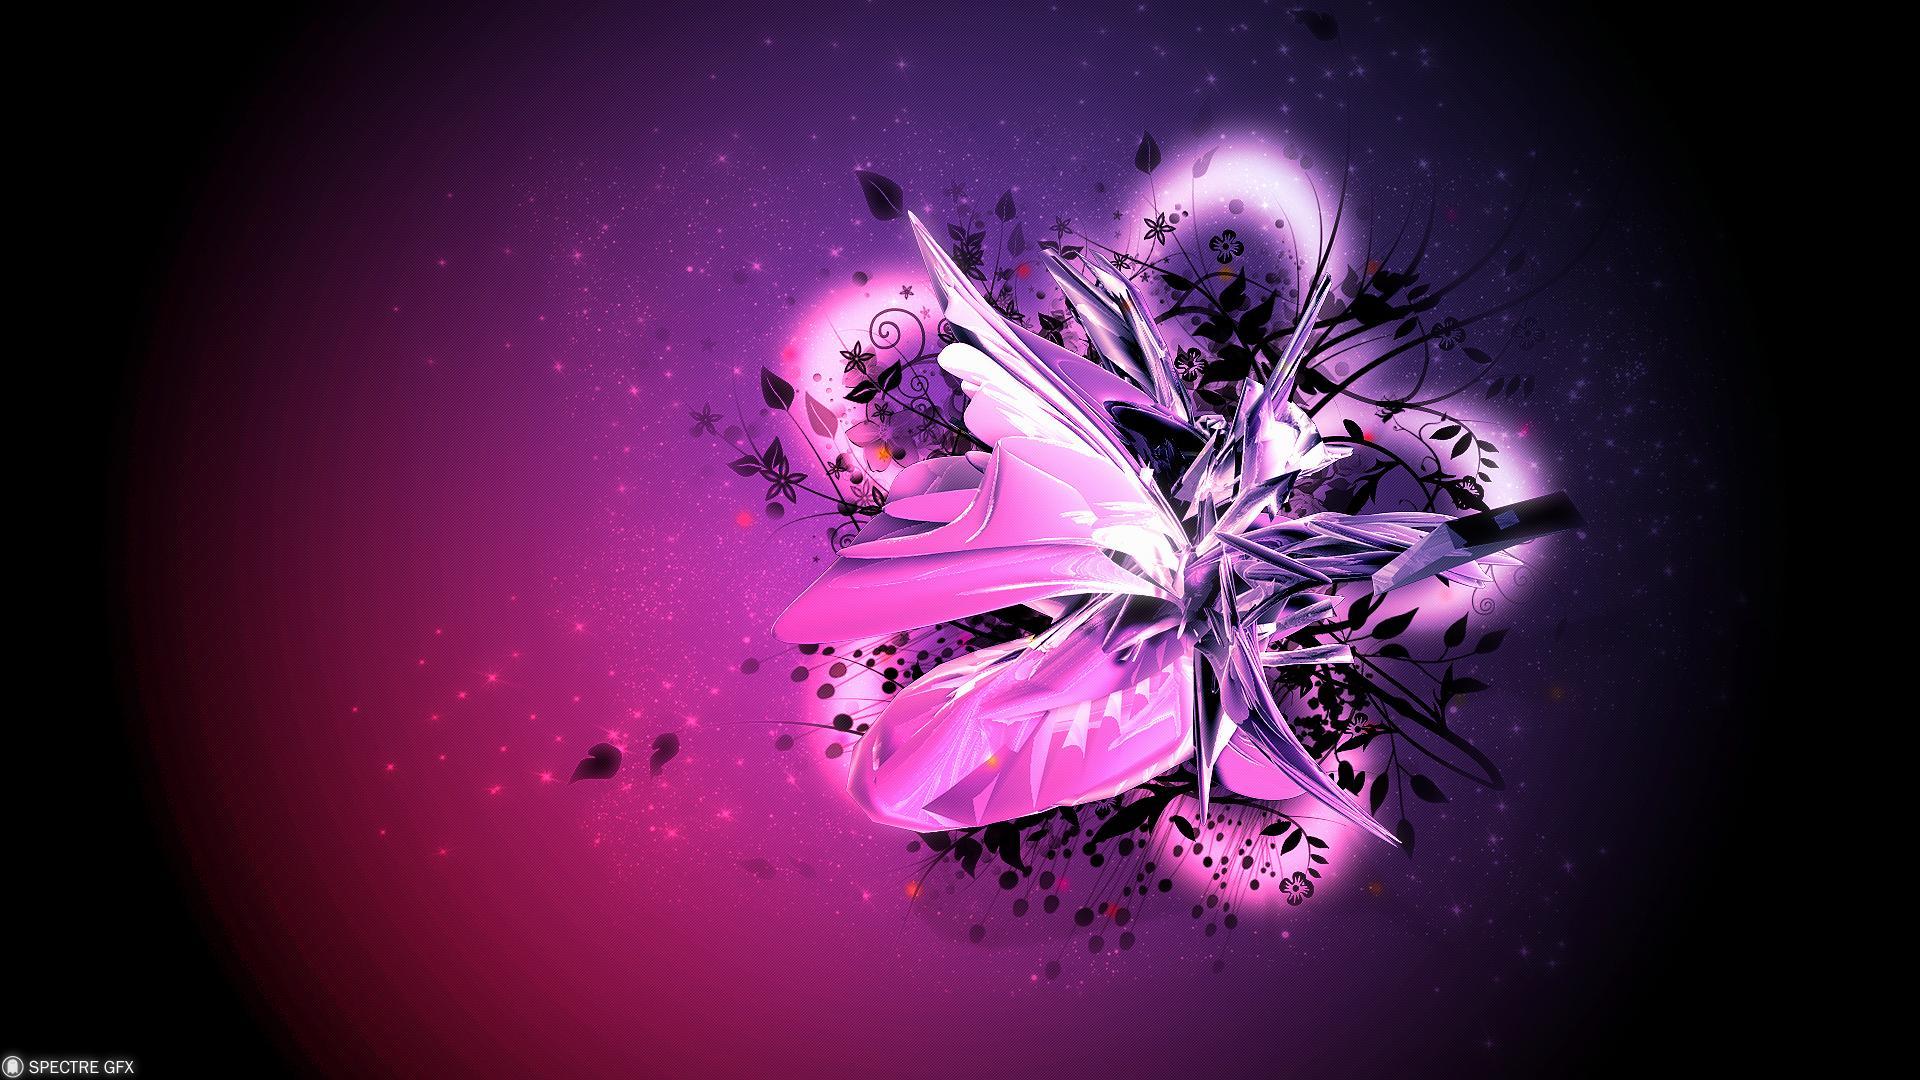 Best Love Fond Ecran Hd: Violet Et Rose Fond D'écran HD